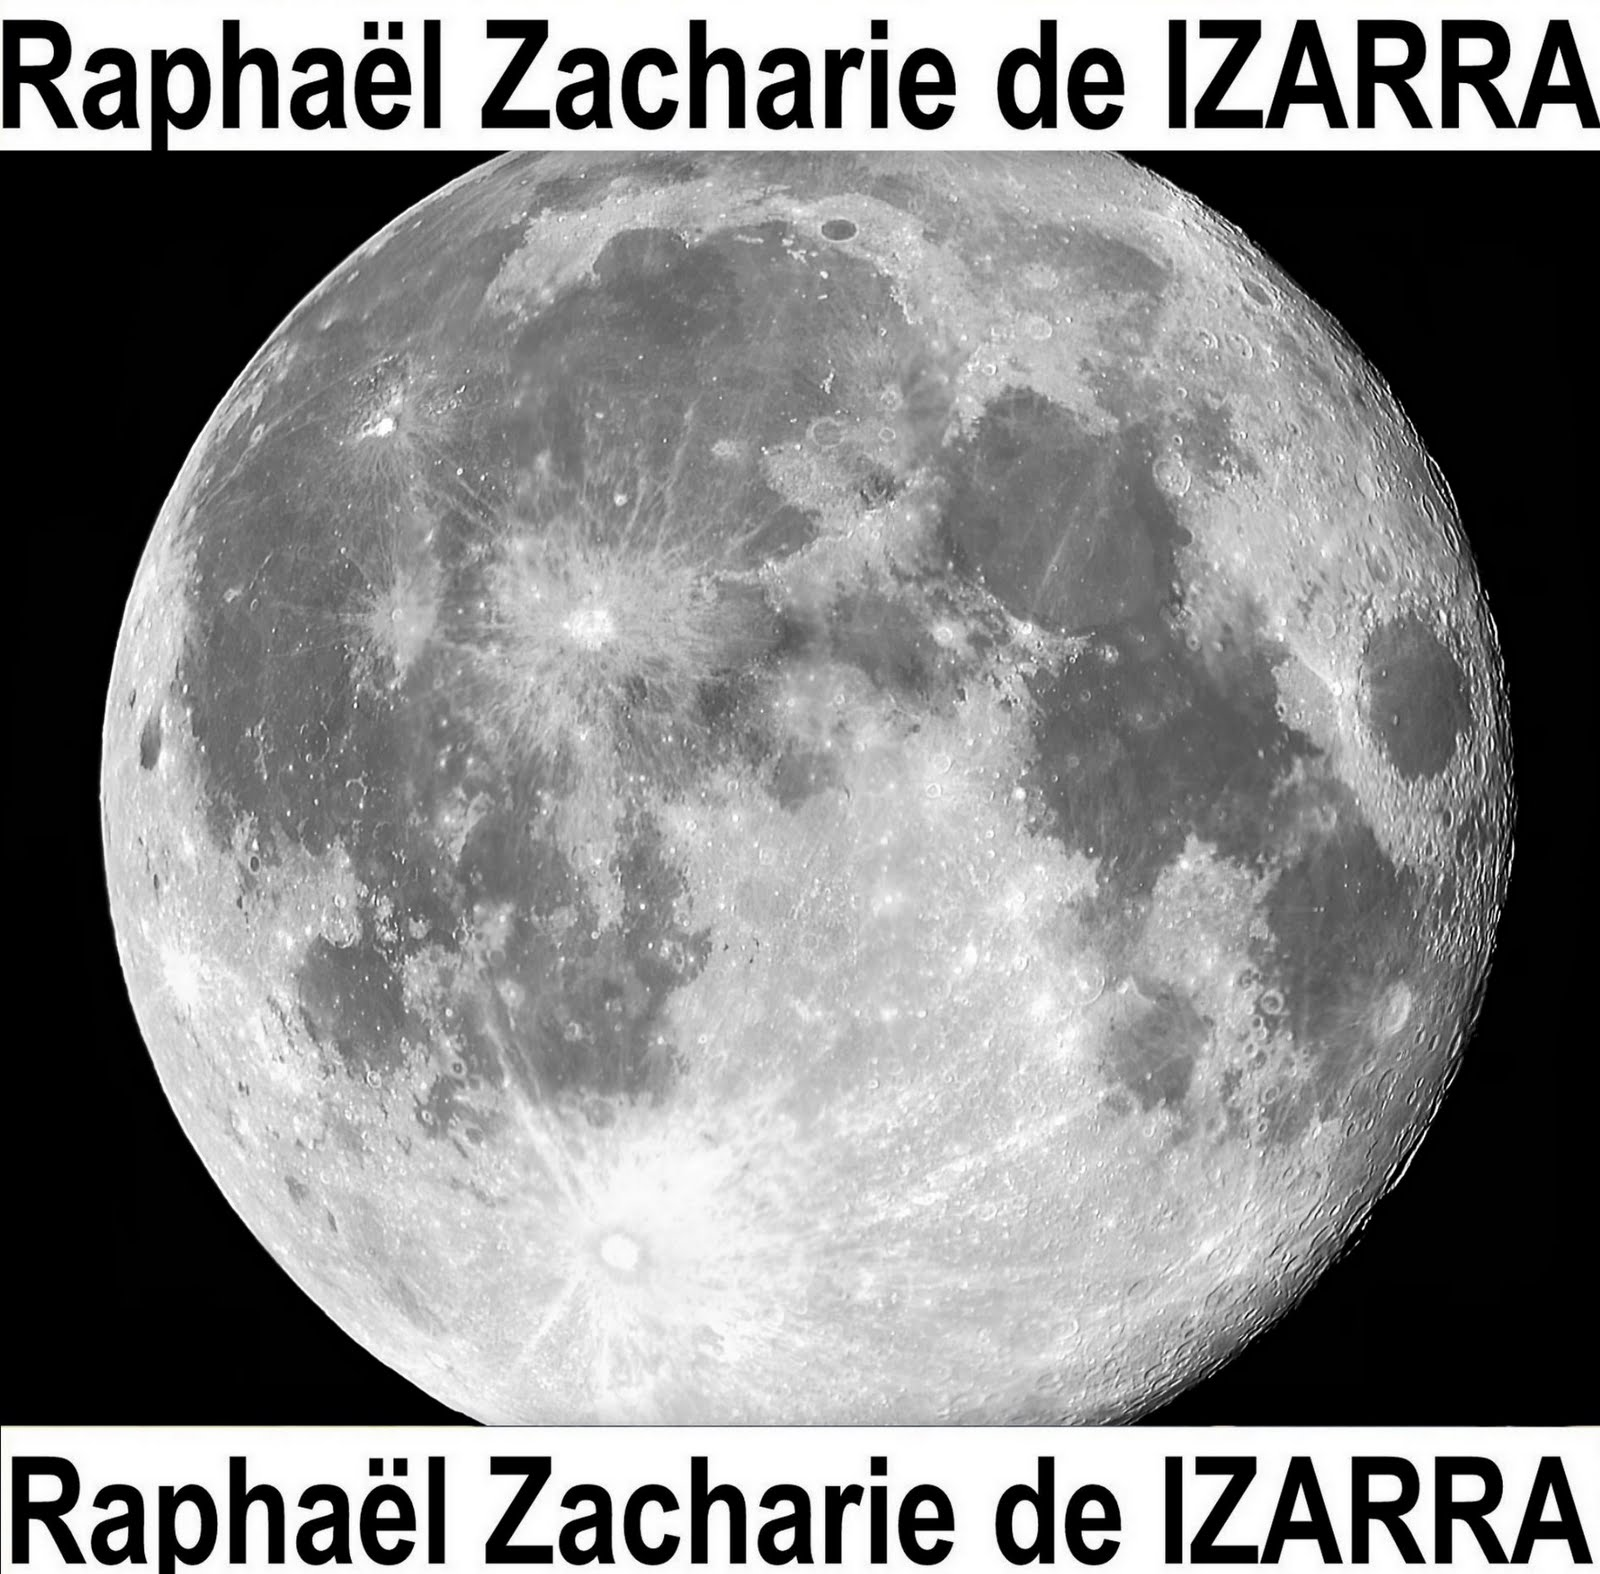 Raphal Zacharie de IZARRA OVNI WARLOY BAILLON UFO ...